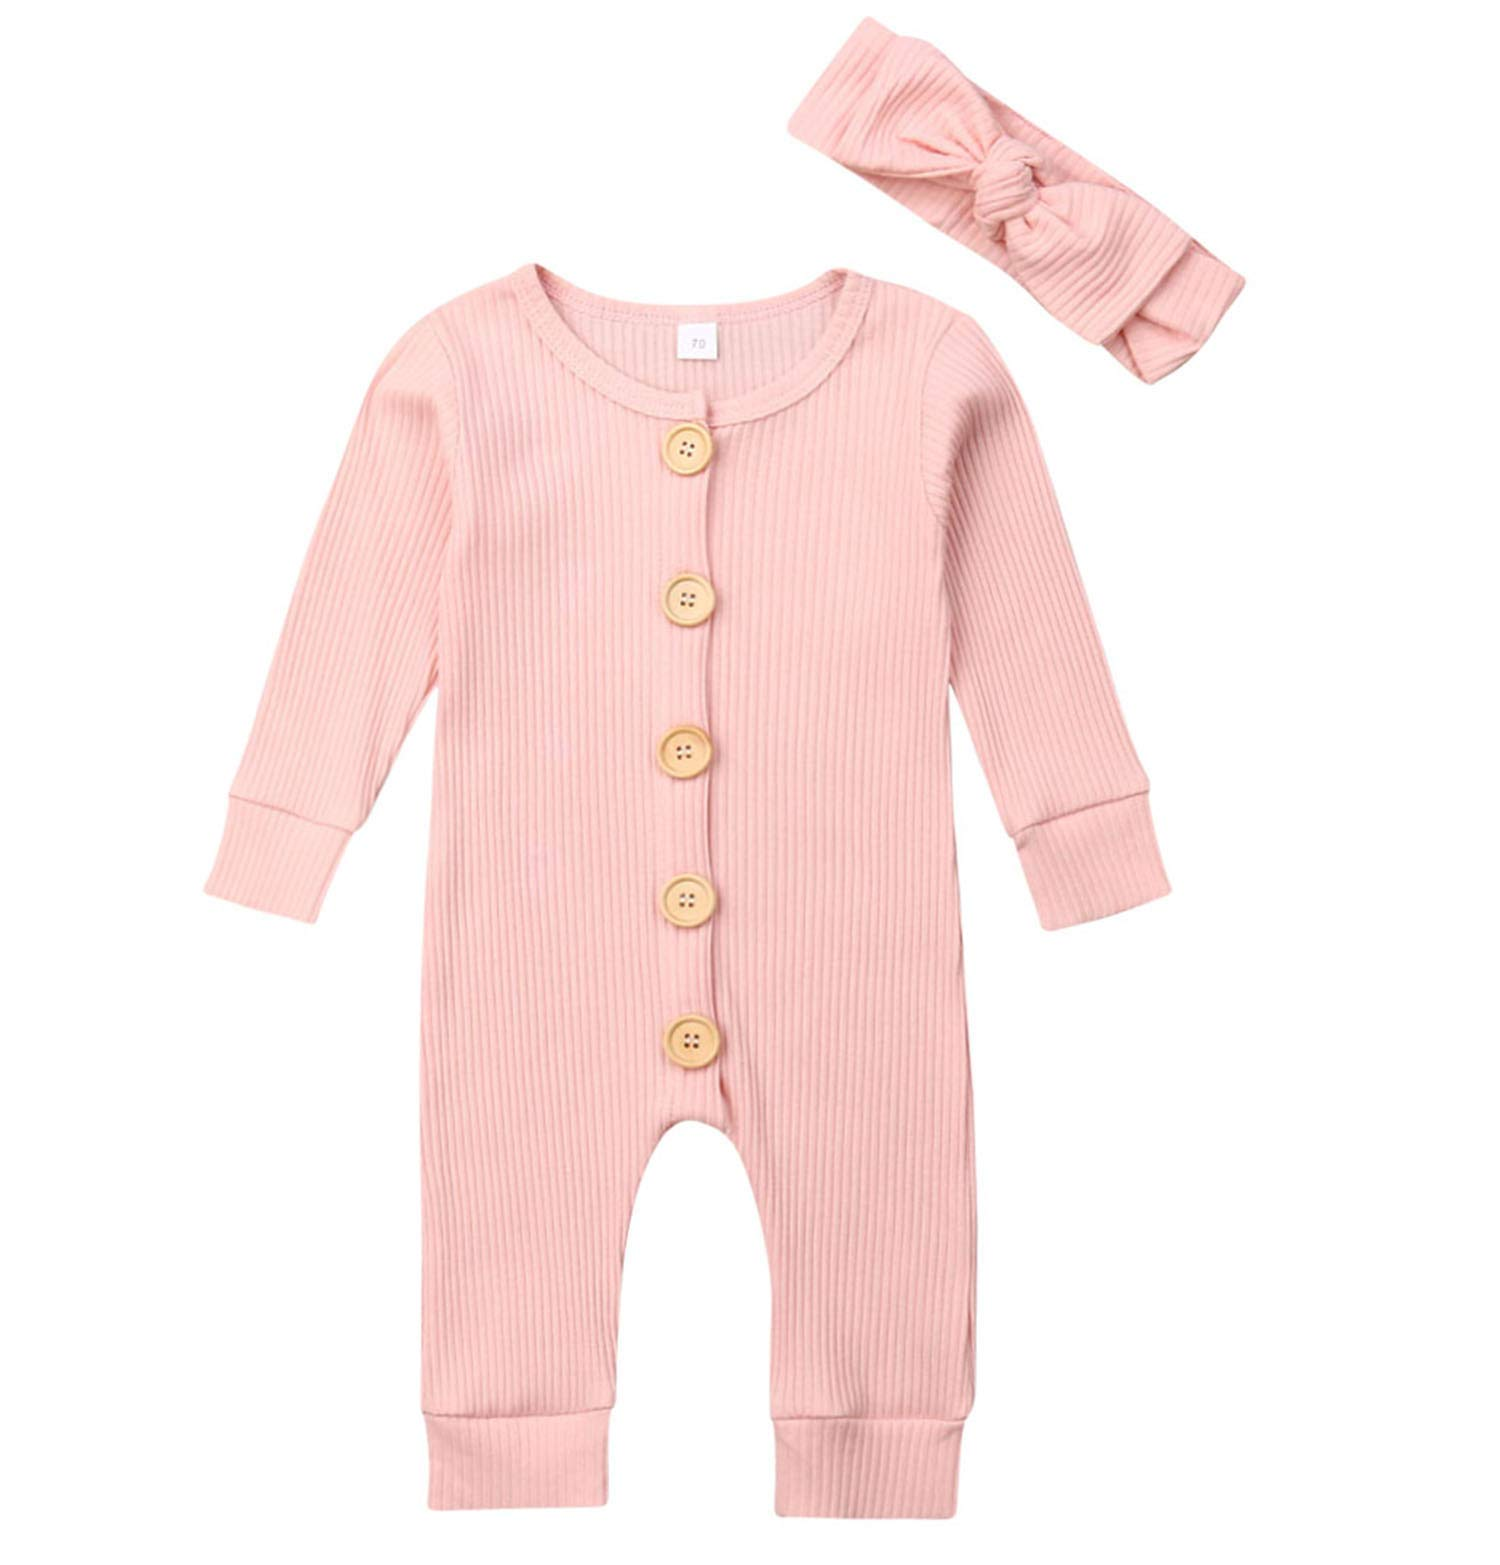 Lefyira Unisex Baby Cotton Linen Solid Color Romper Cute Bodysuit with Button Short Sleeve Infant Summer Clothes